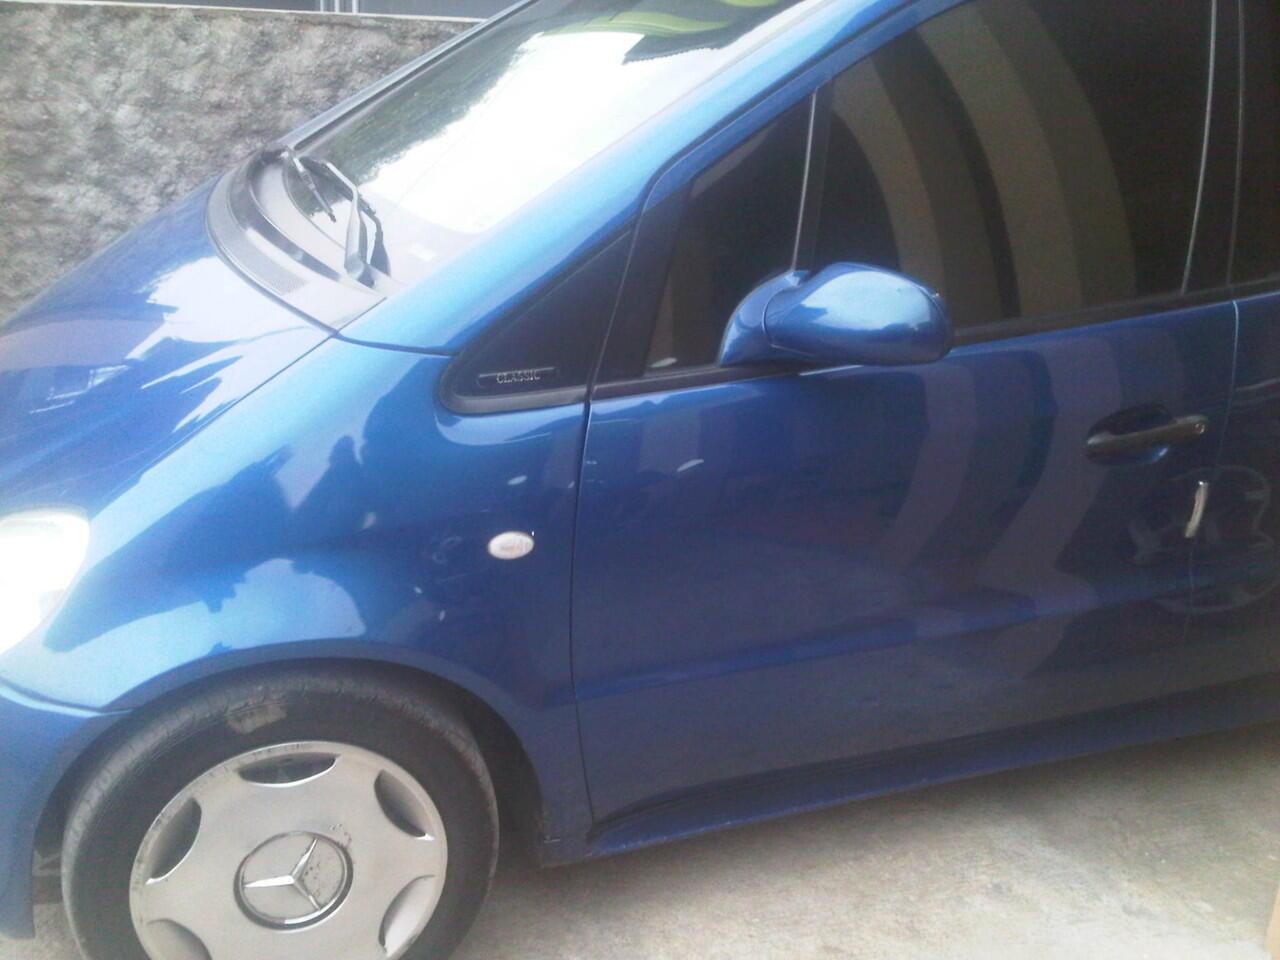 Mercrdes Benz A140 Semarang